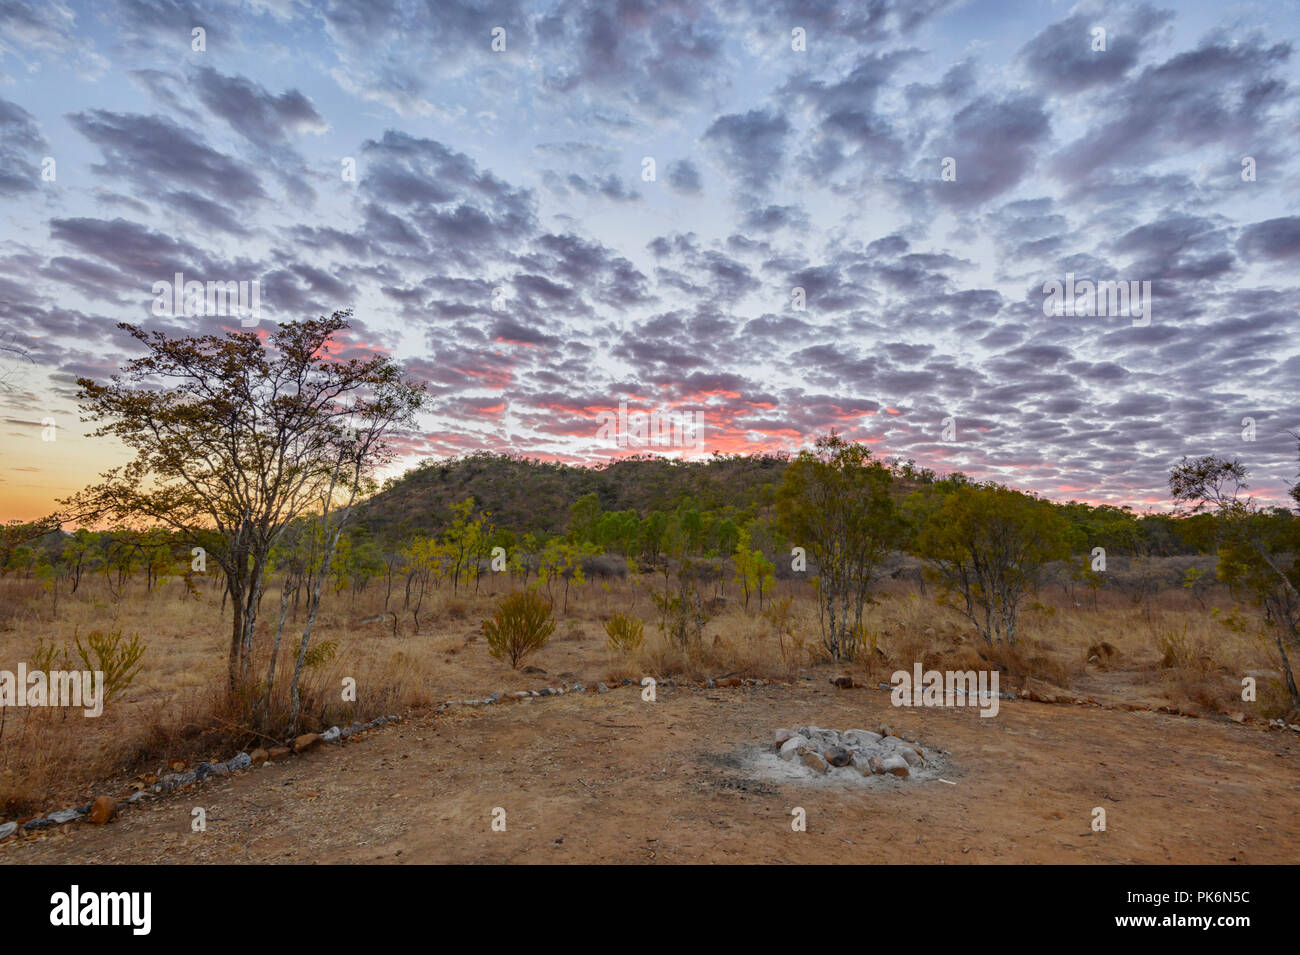 Caballa Sky al amanecer en Chillagoe, Norte de Queensland, Queensland, Australia Imagen De Stock